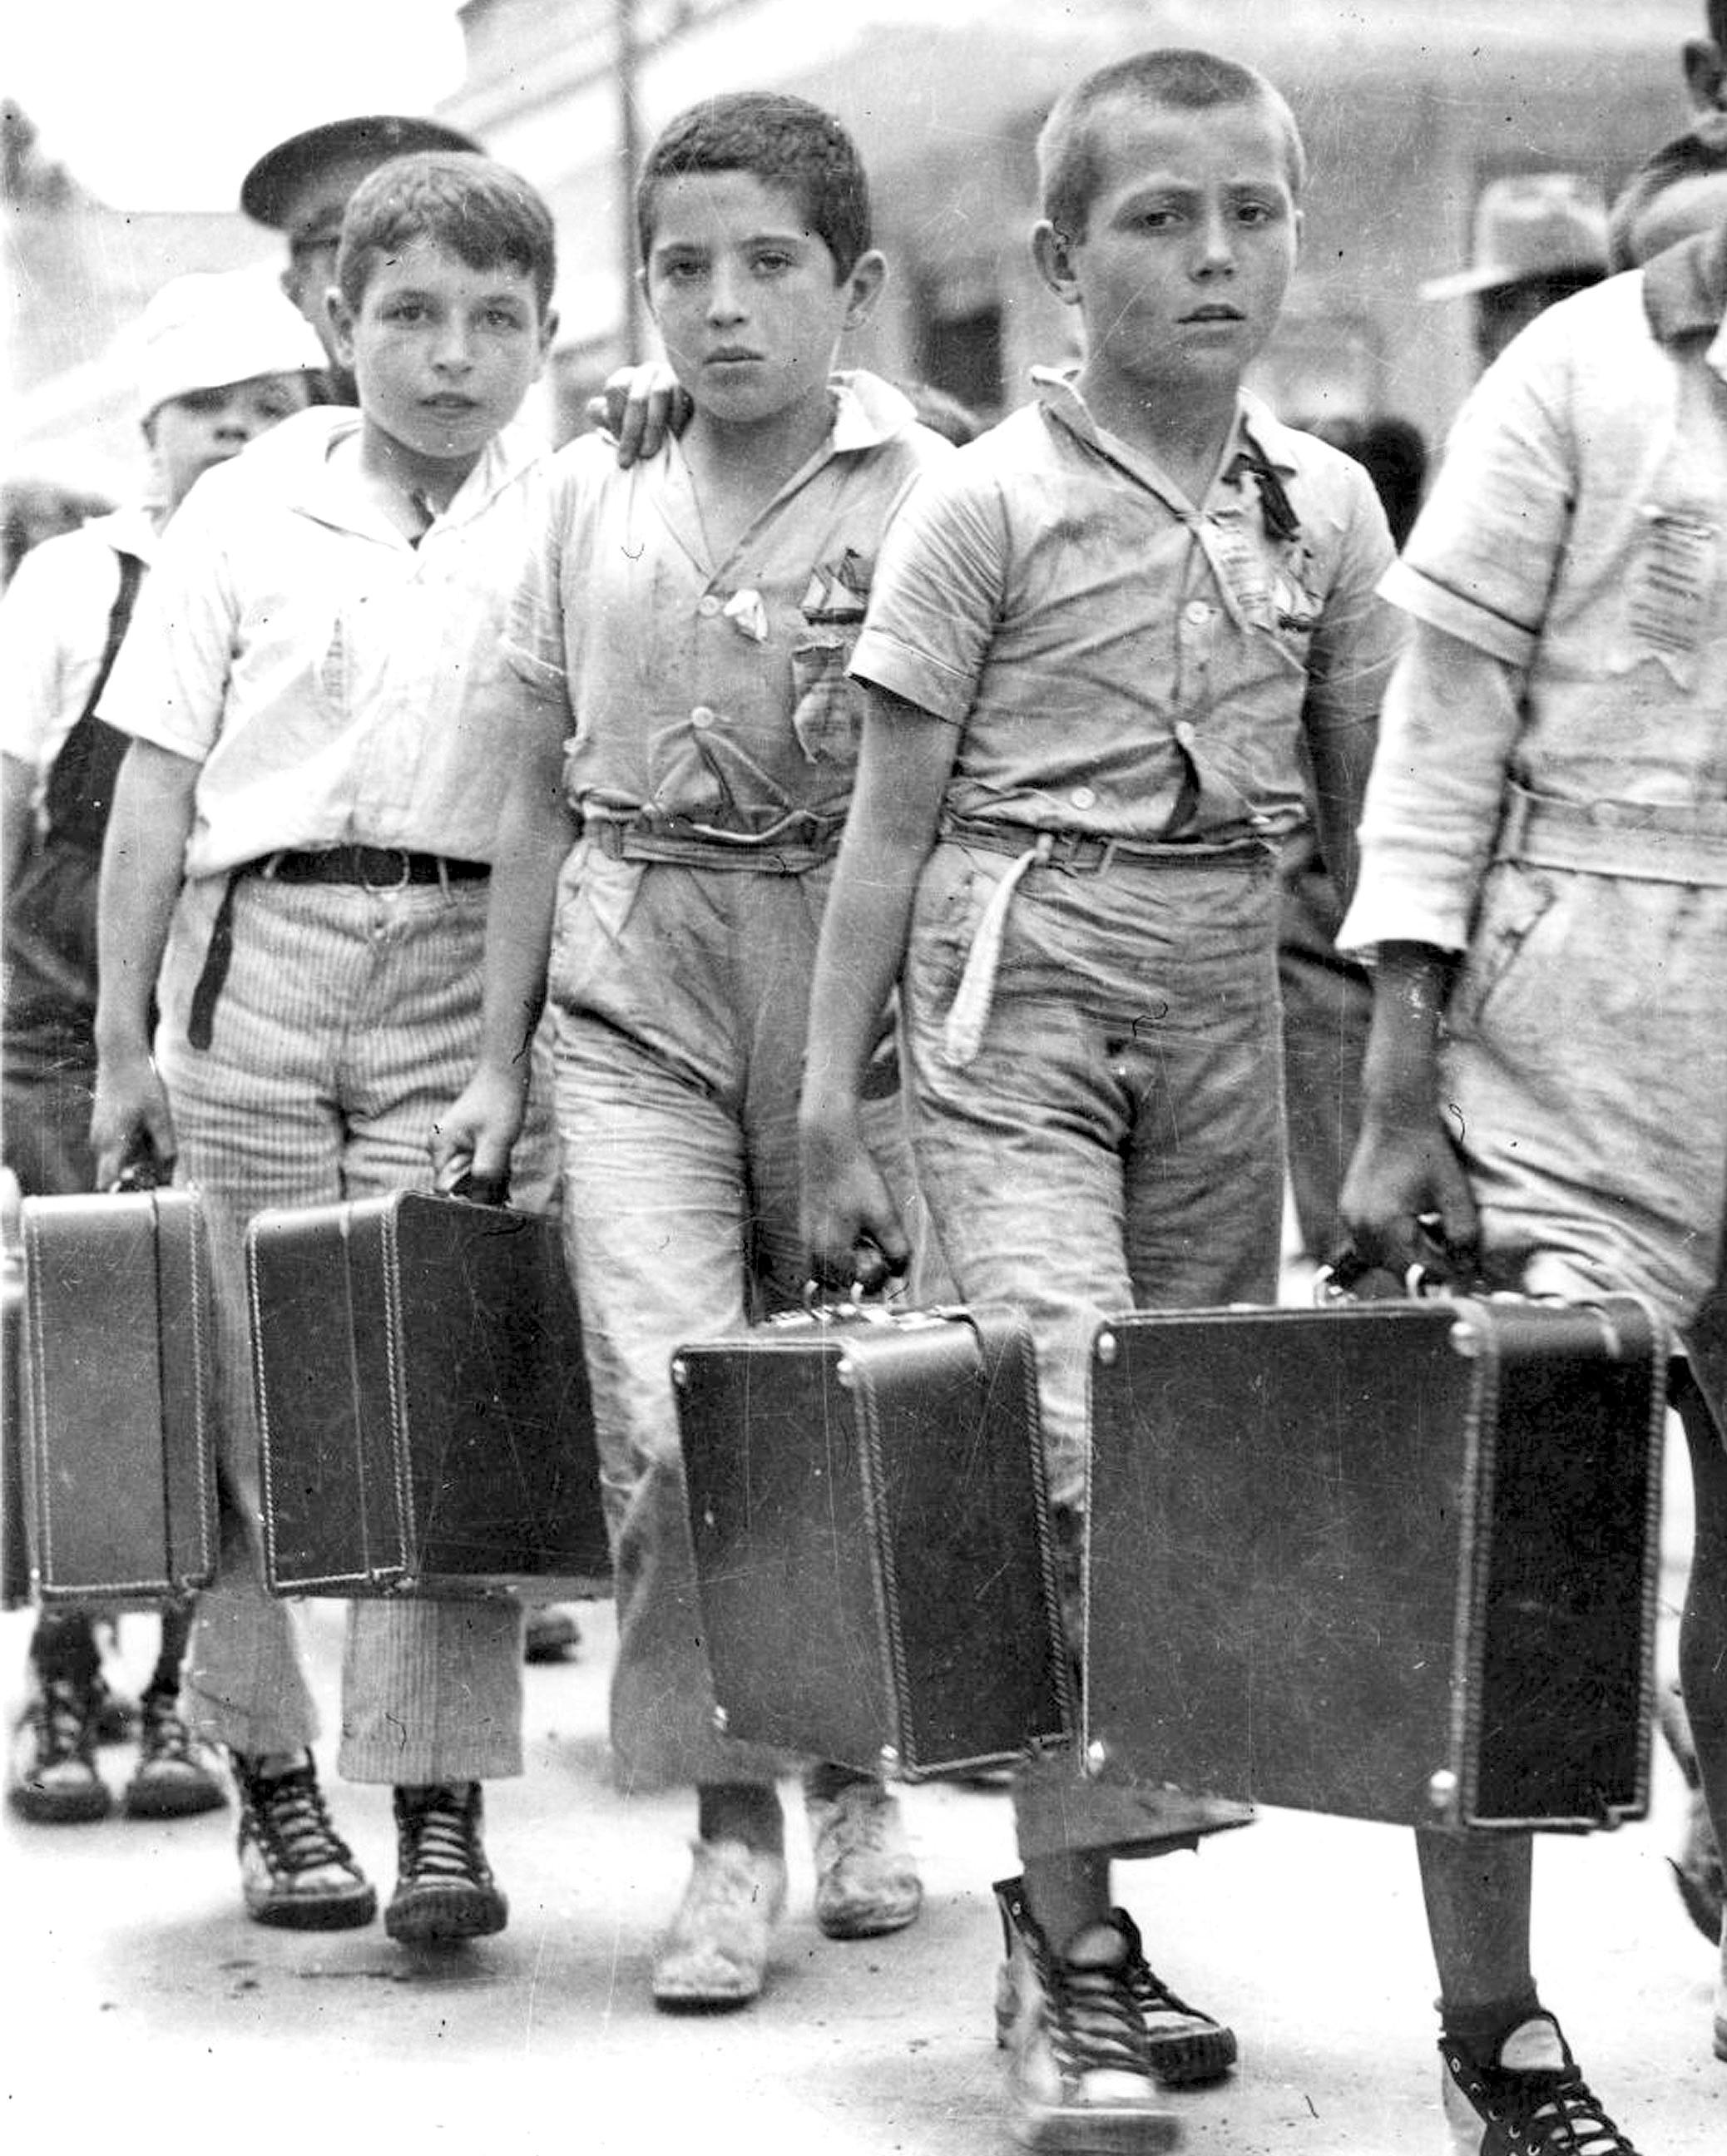 Spanish children, children of Republicans, go into exile in 1939.